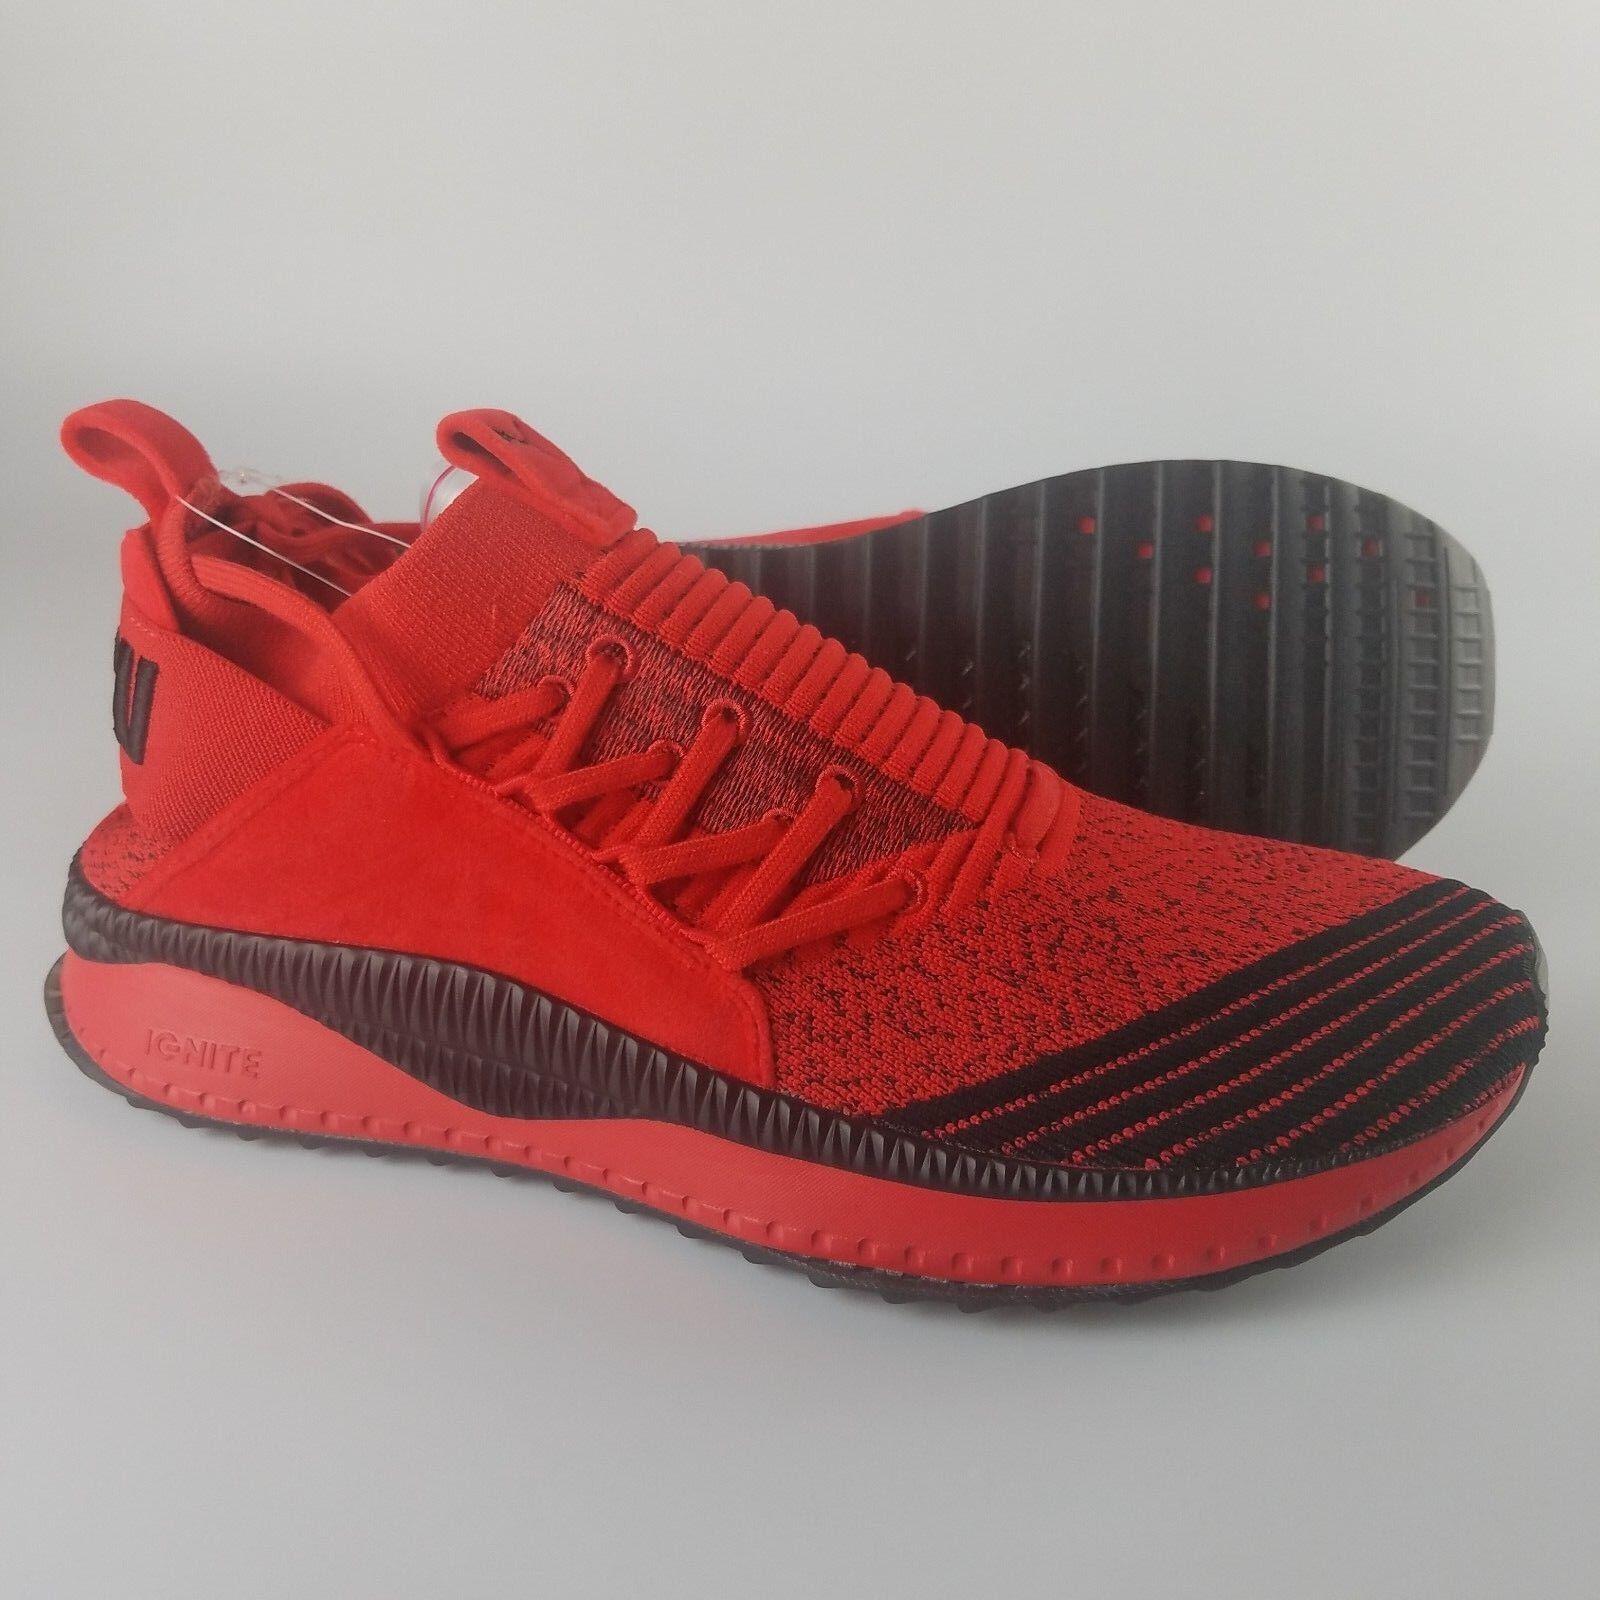 Puma FUBU Tsugi Jun High Risk Red Black Men's Size 9.5 Running shoes